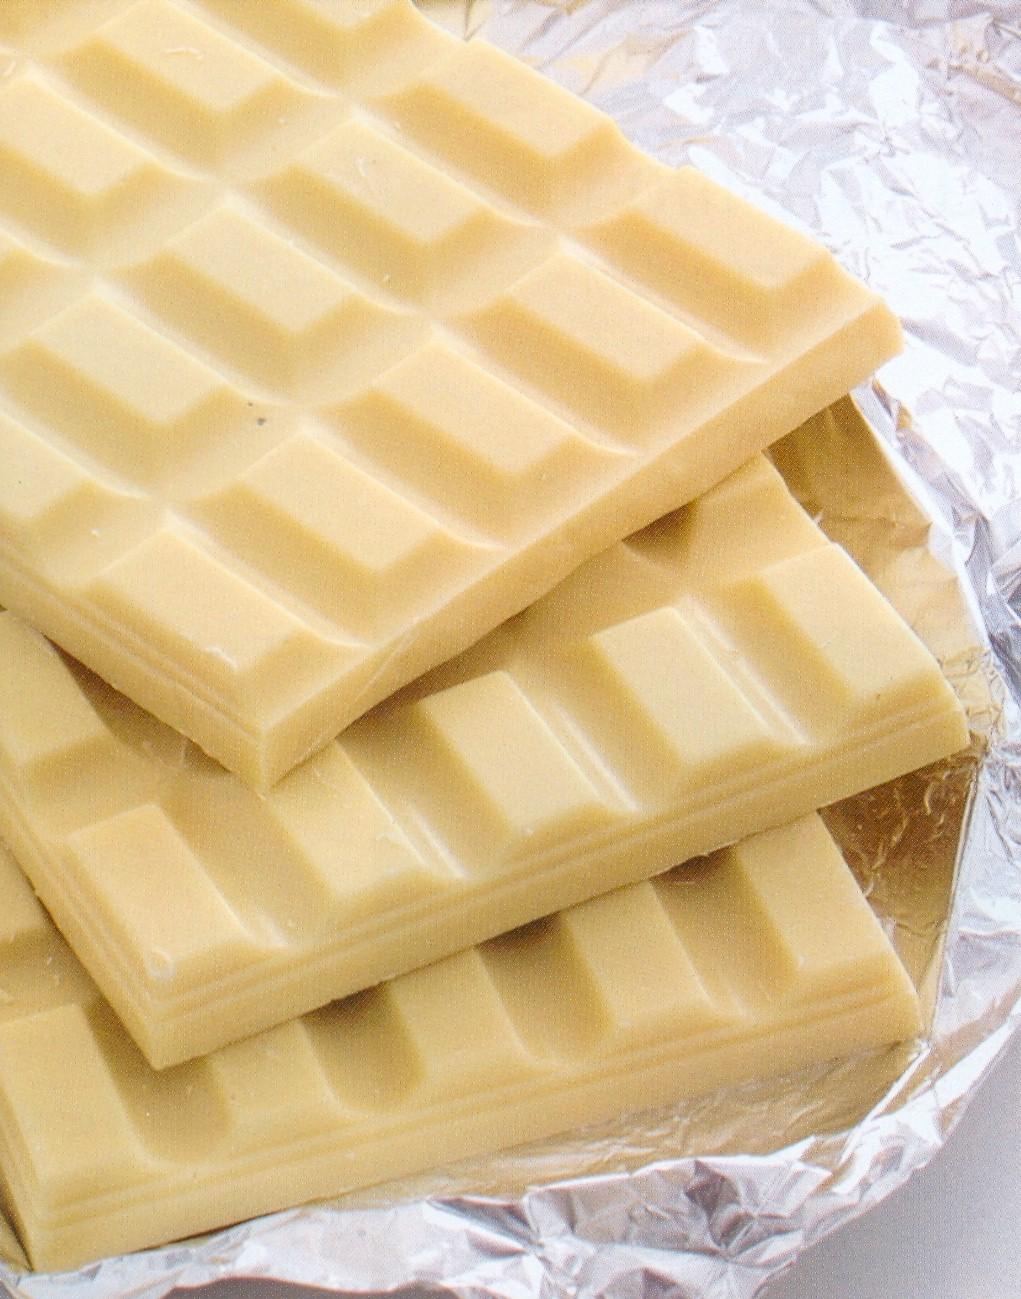 Baño Chocolate Blanco:White Chocolate